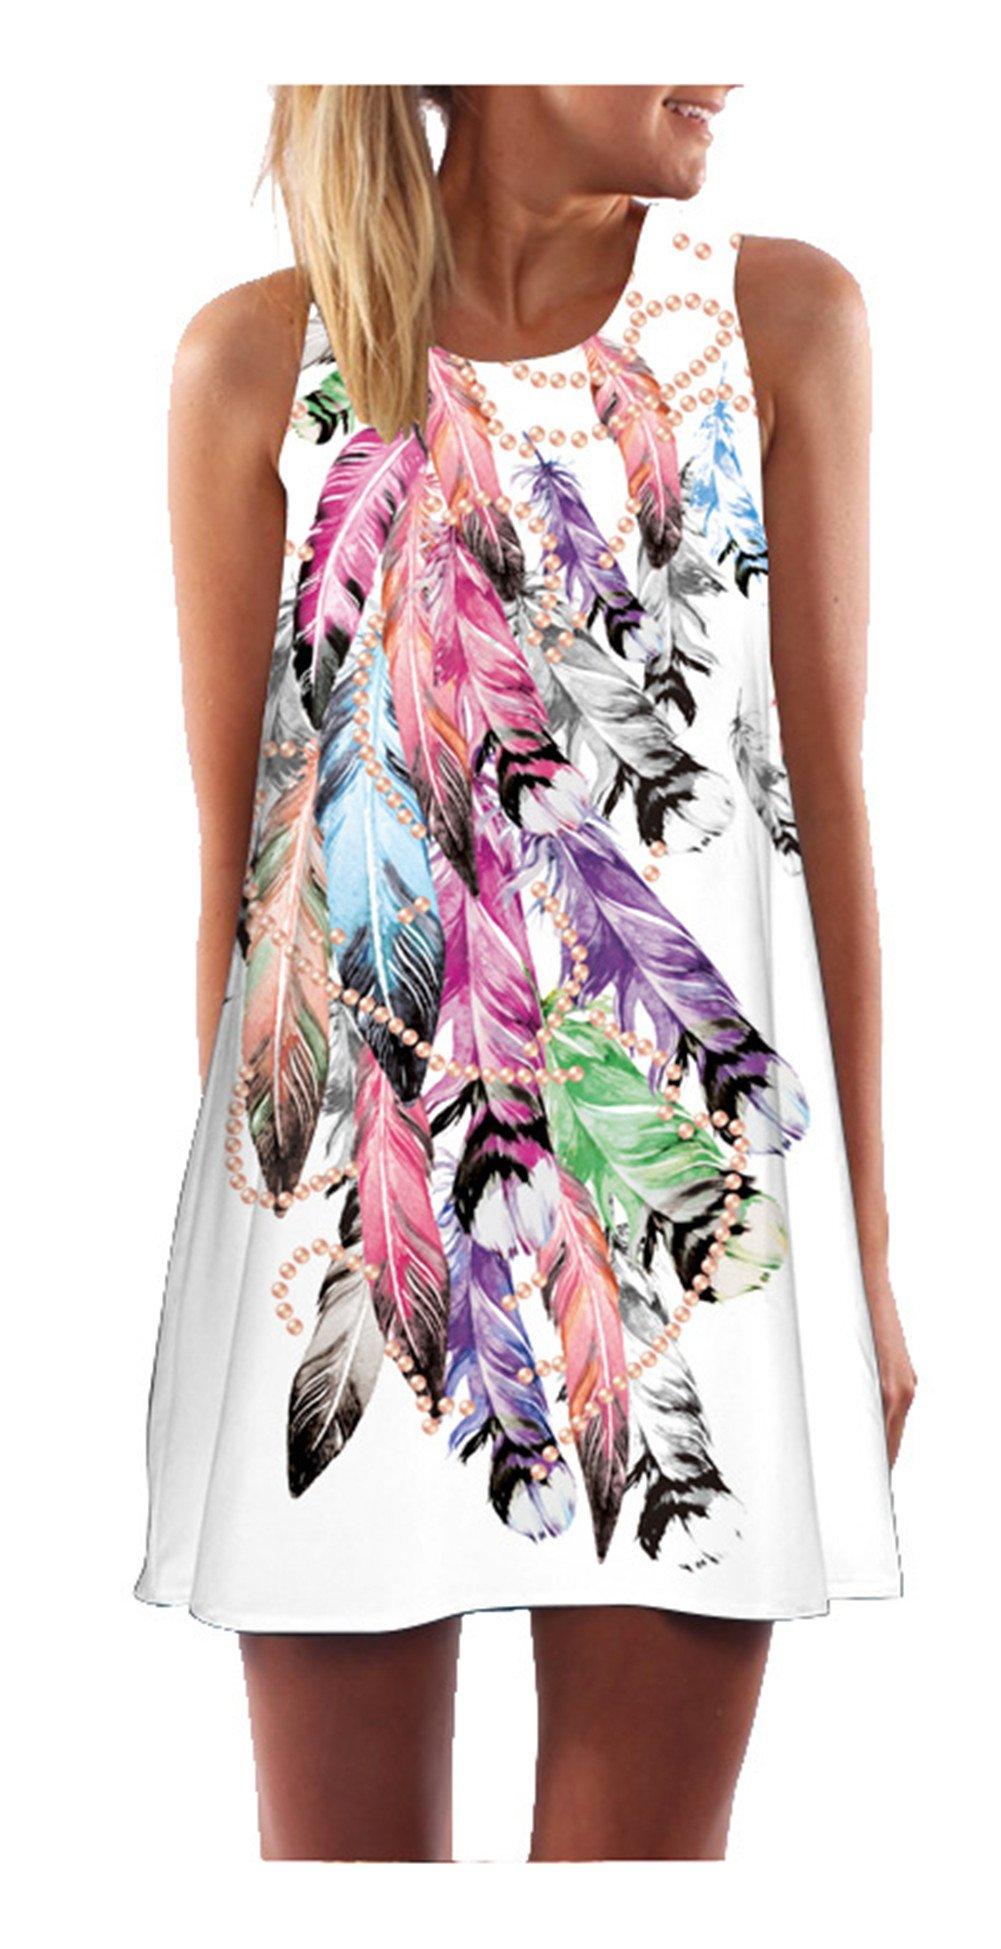 SRYSHKR 2018 Women's Summer Sleeveless Damask Floral Print Casual Loose T-Shirt Dress (XXL, Pink)